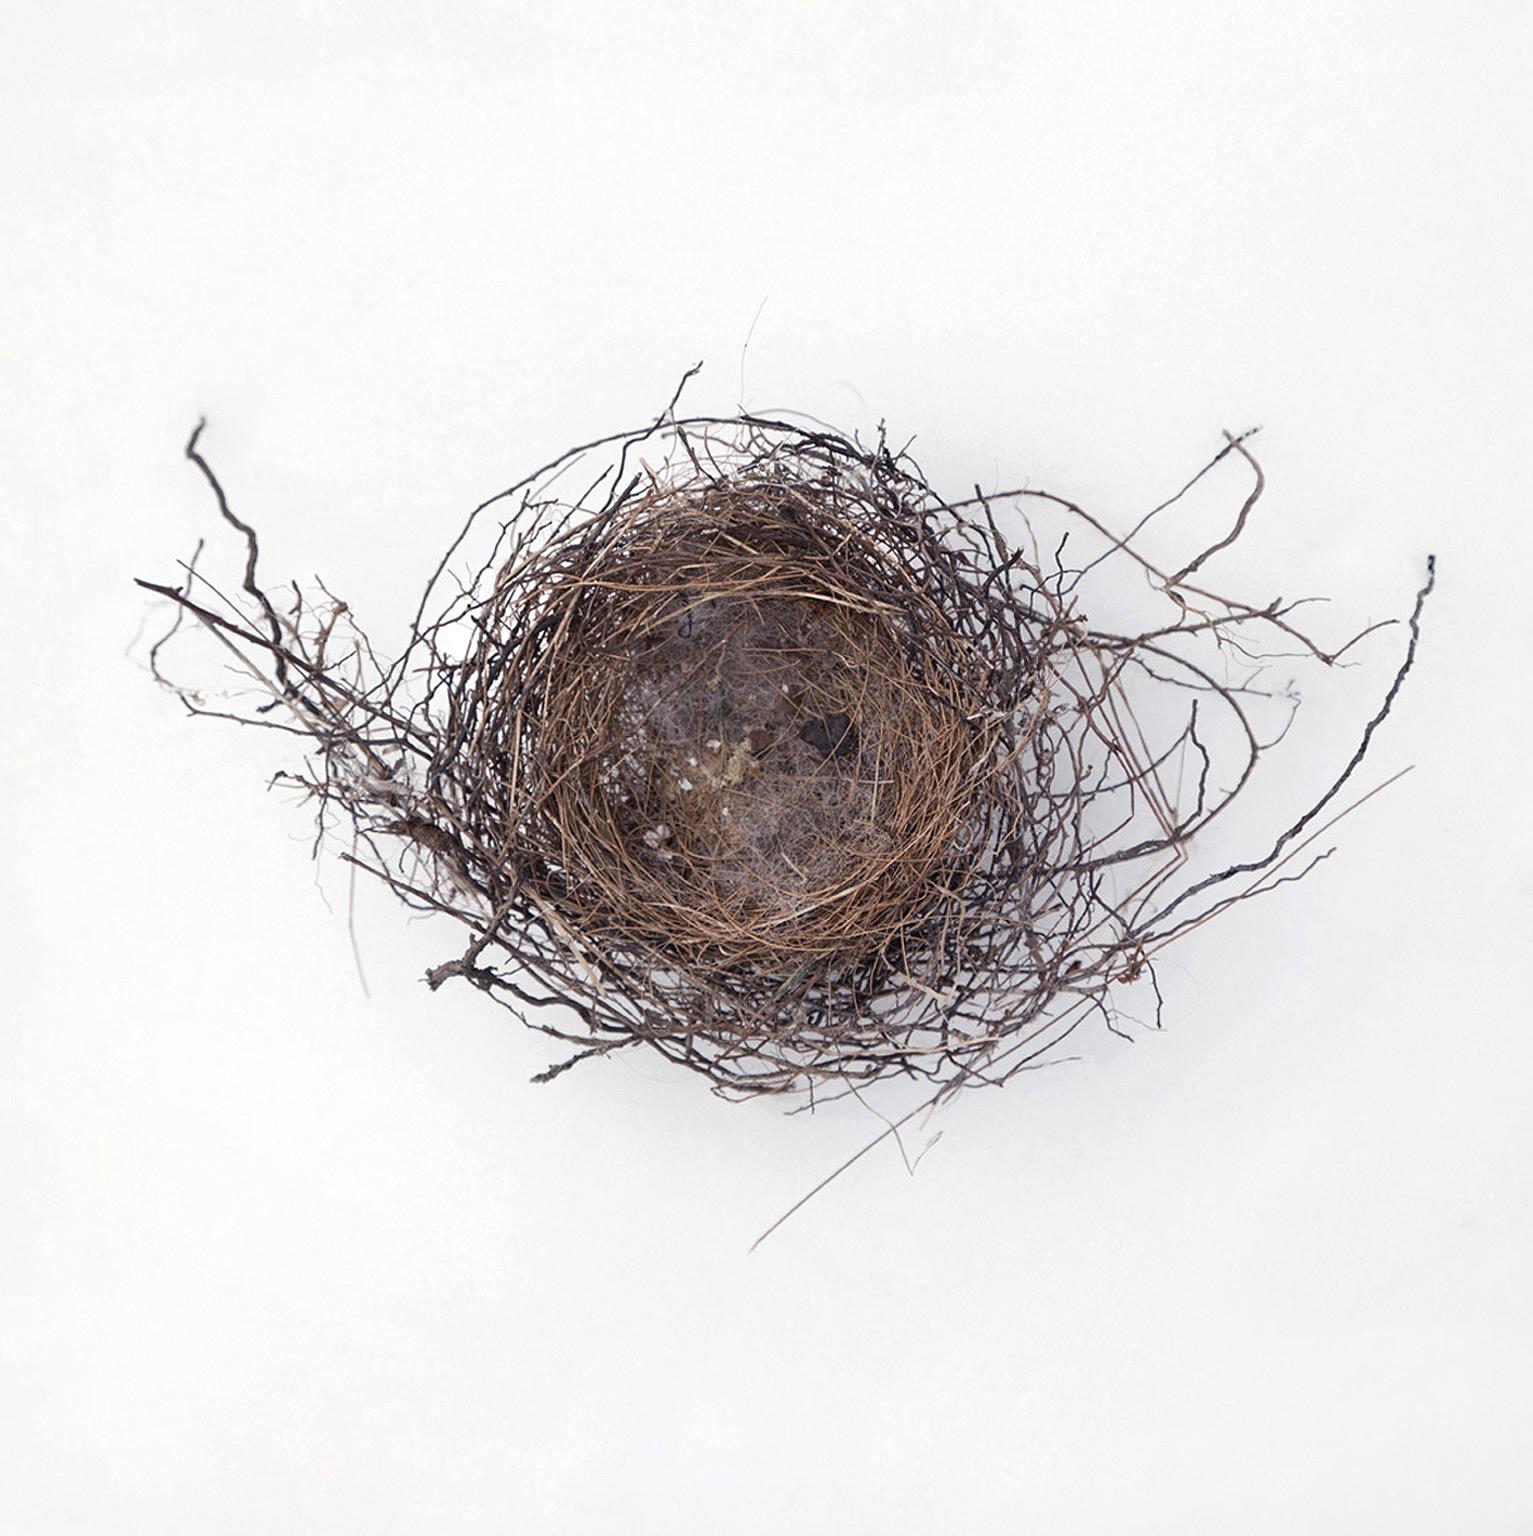 Nest #1750, 2017, archival pigment print, 10 x 10 in, $950; 16 x 16 in, $1,500